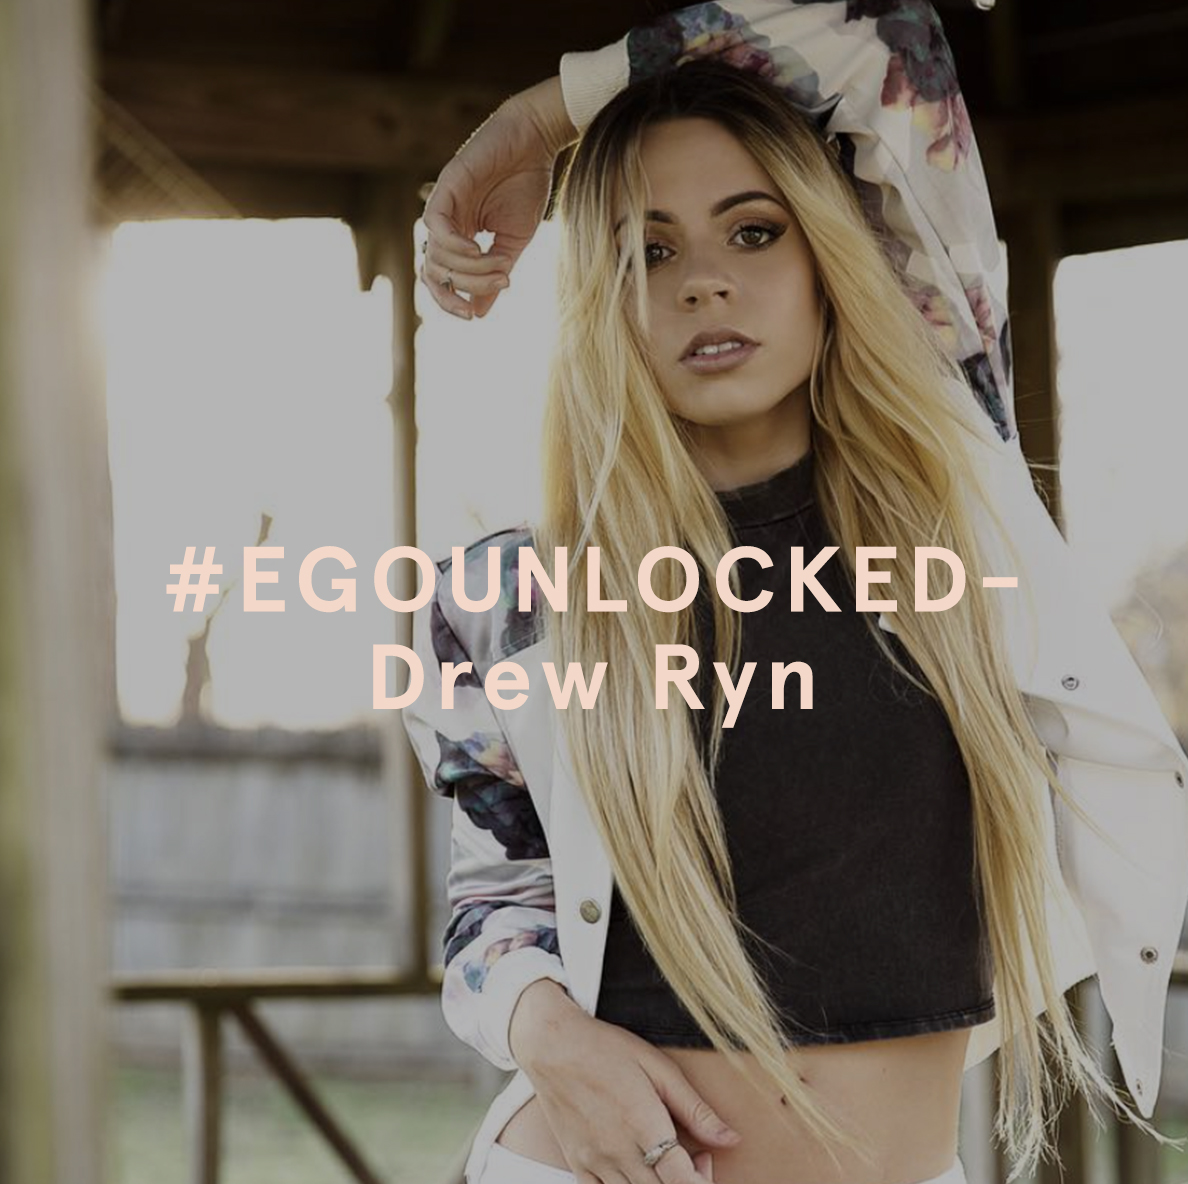 Drew Ryn Ego Unlocked